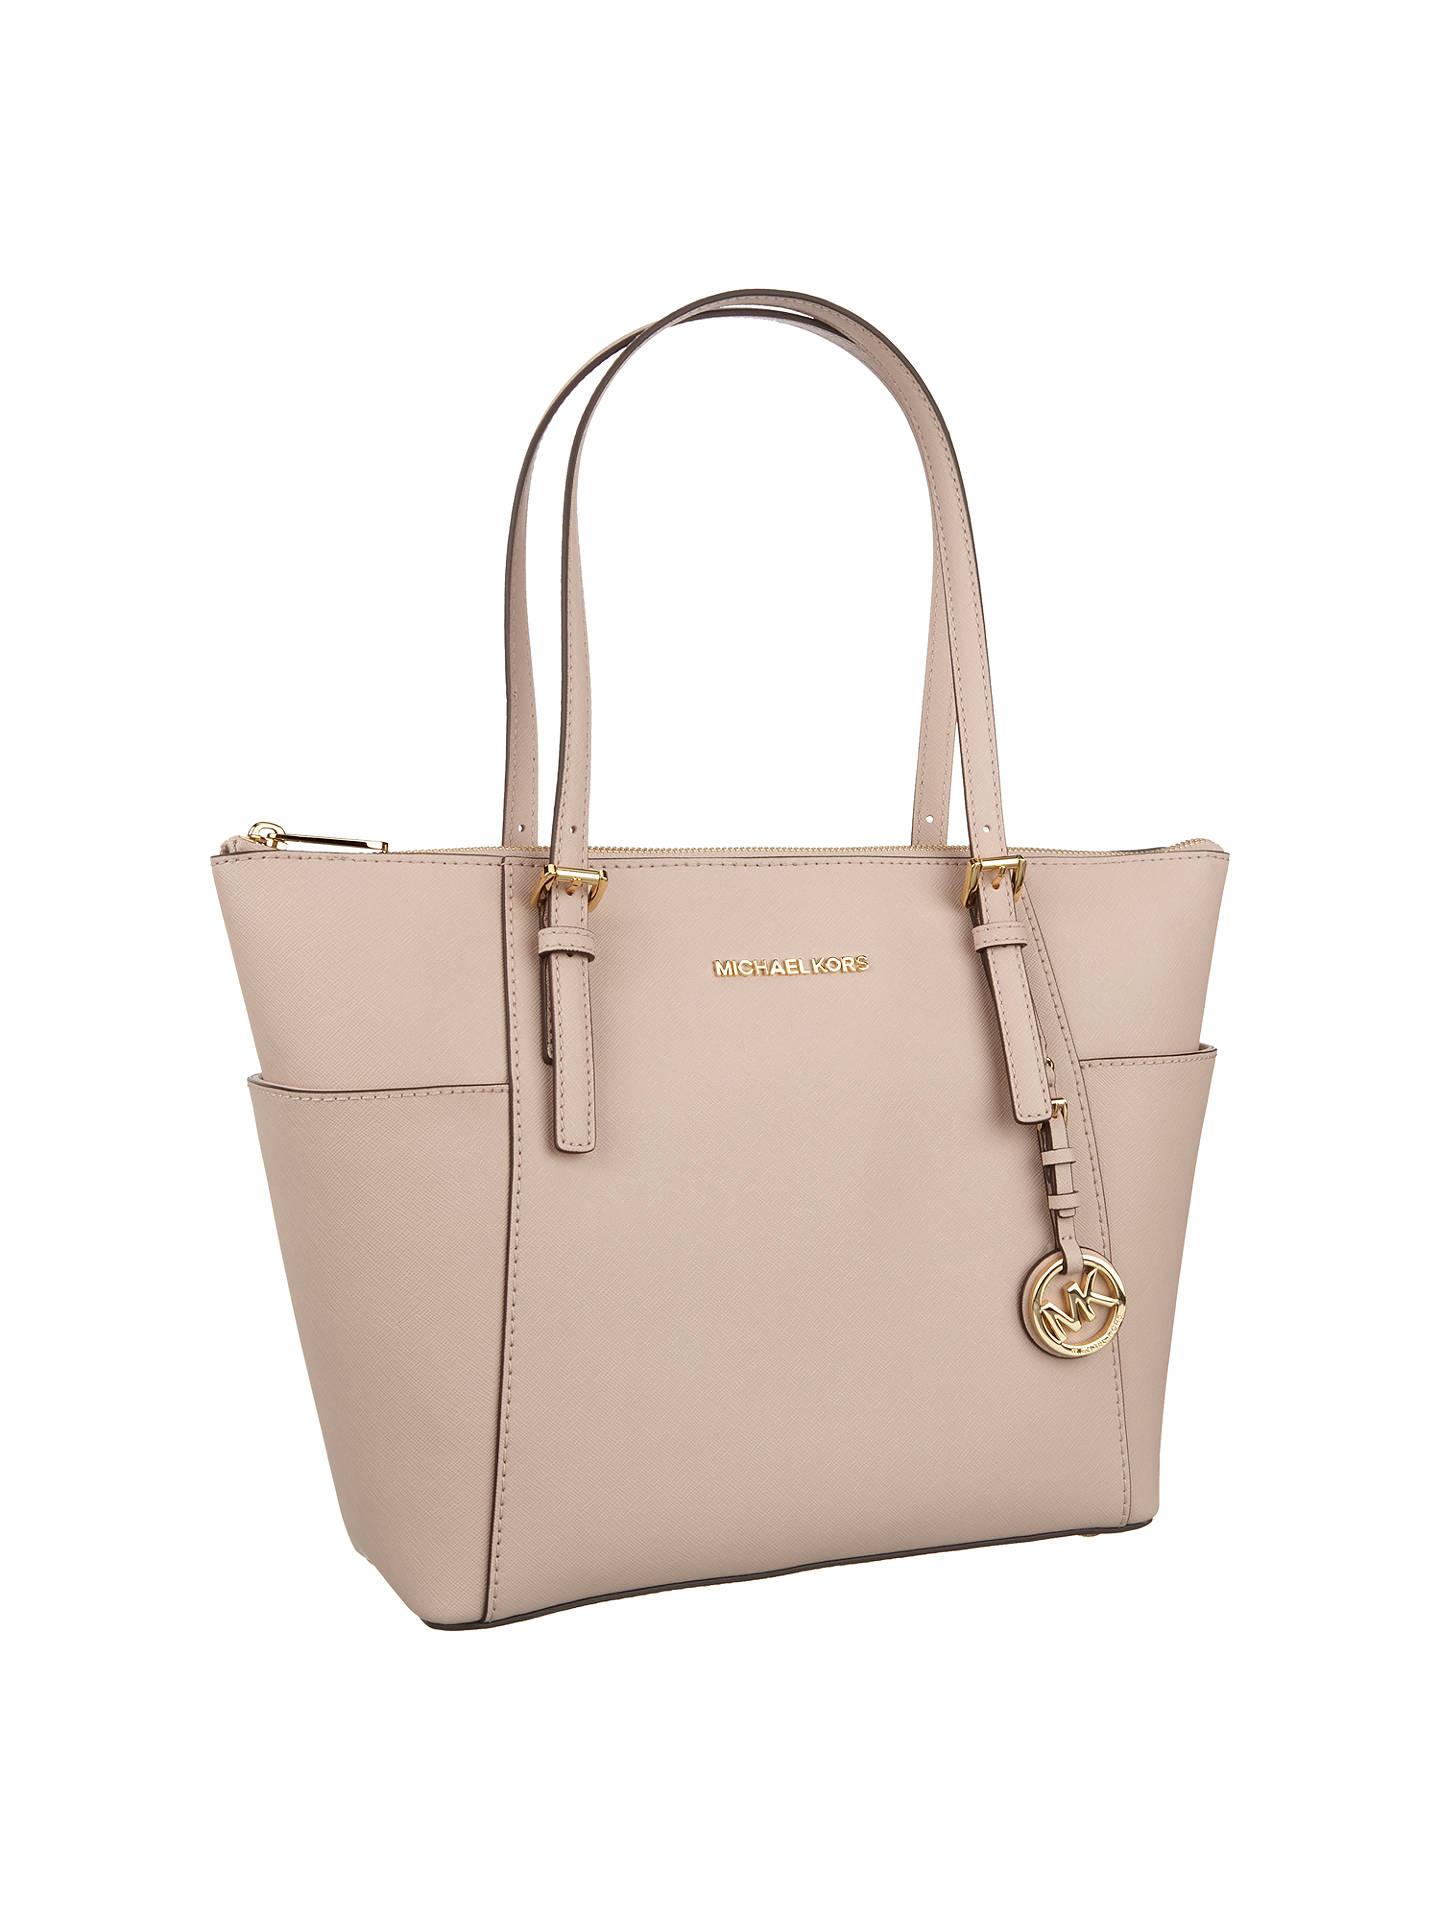 ec0594aad ... Buy MICHAEL Michael Kors Jet Set East/West Leather Tote Bag, Soft Pink  Online